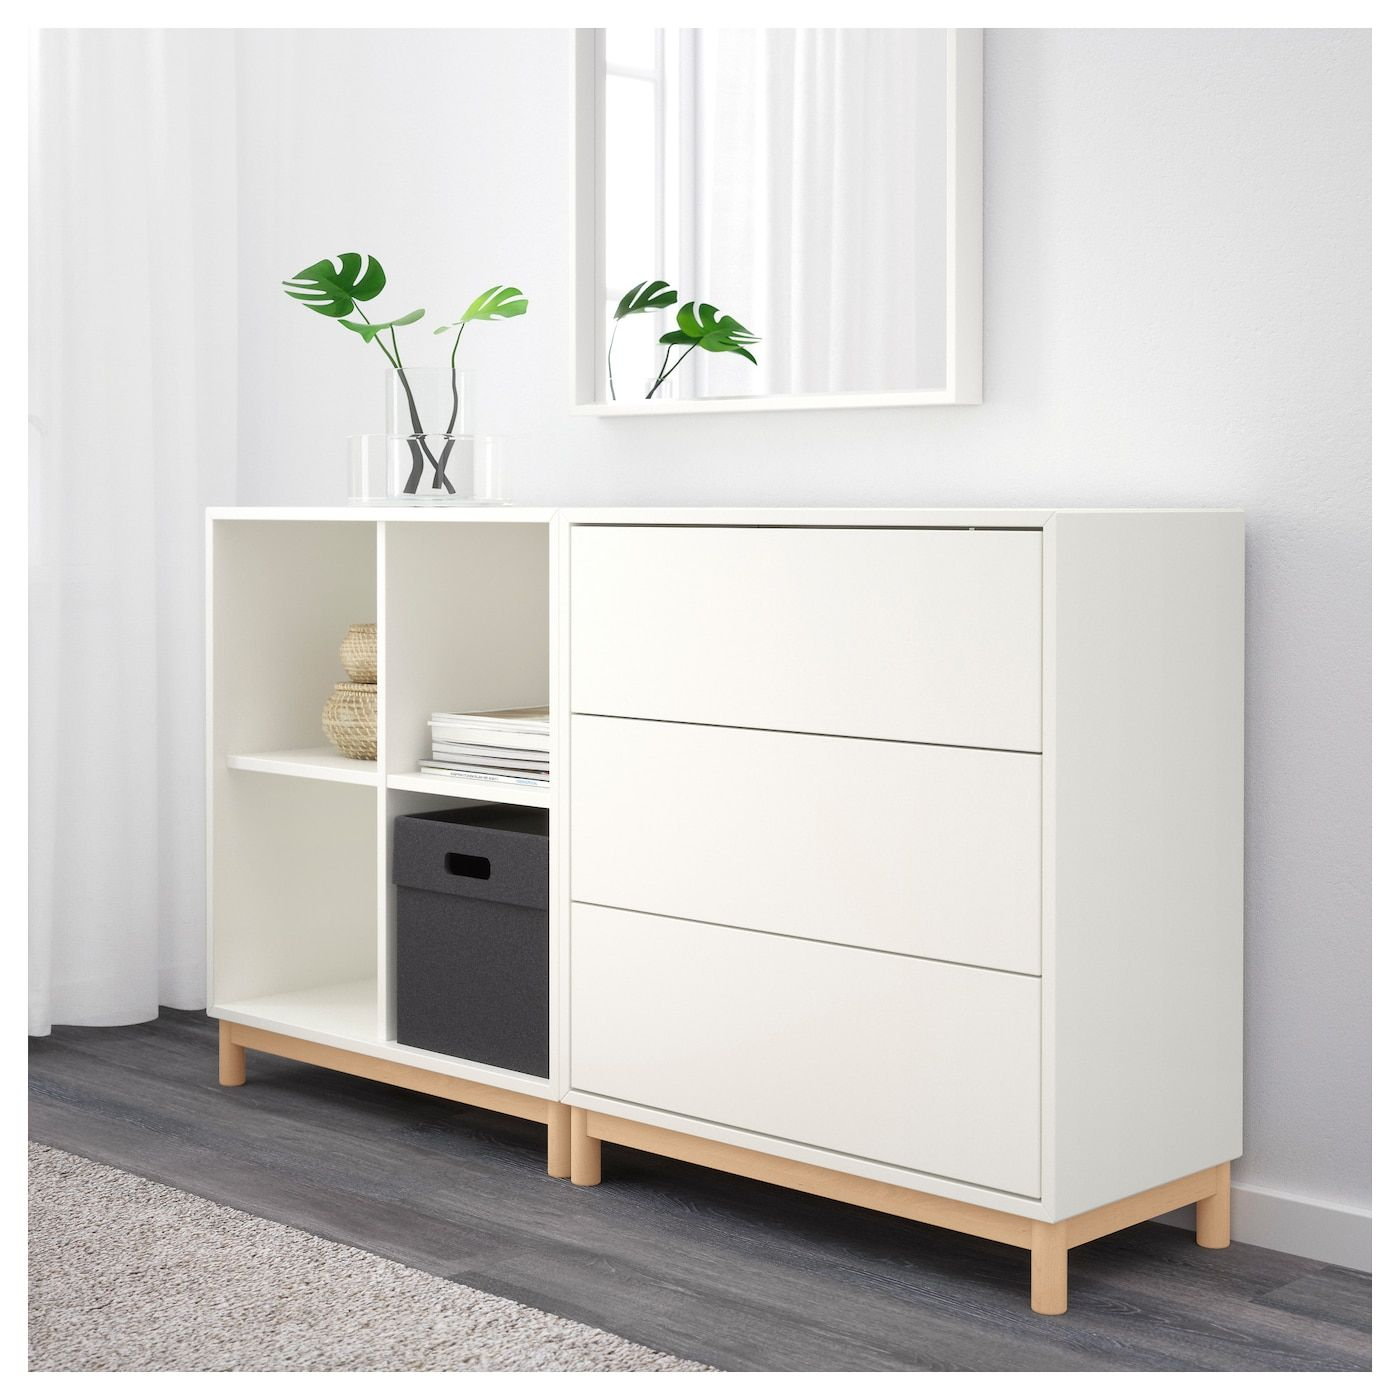 Ikea Mobler Inredning Och Inspiration Mobelideer Hjemmeinnredning Ikea Soverom